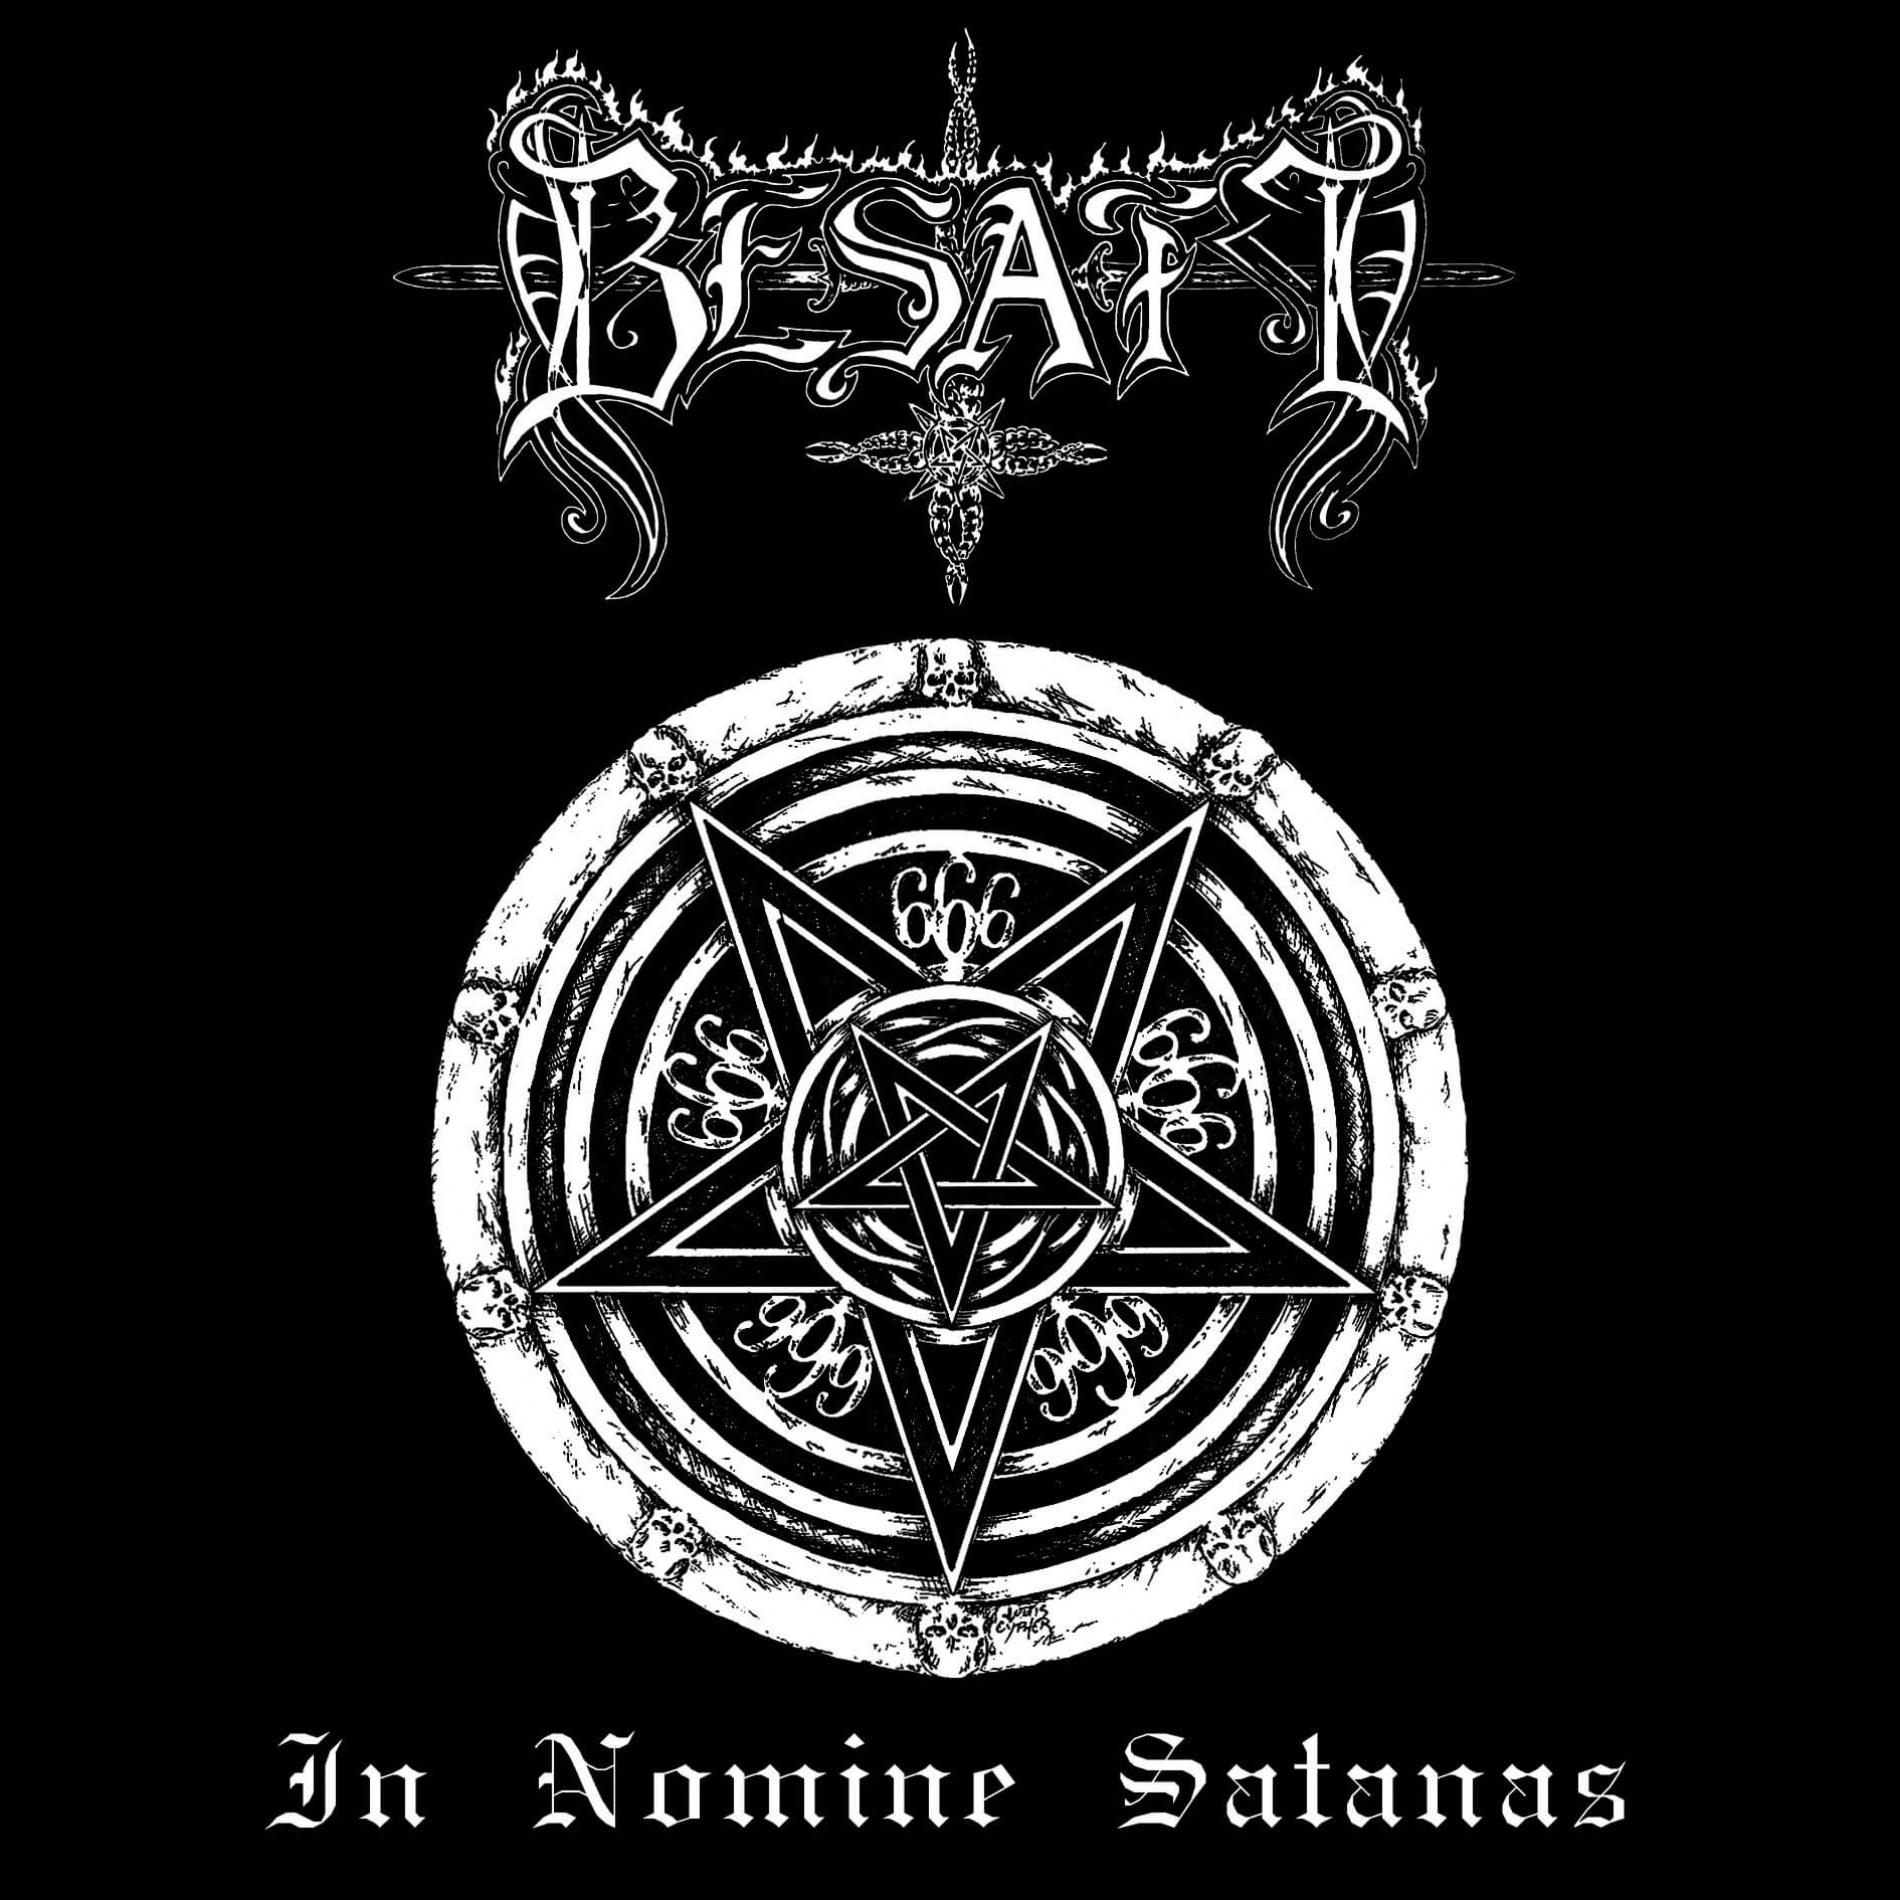 Review for Besatt - In Nomine Satanas